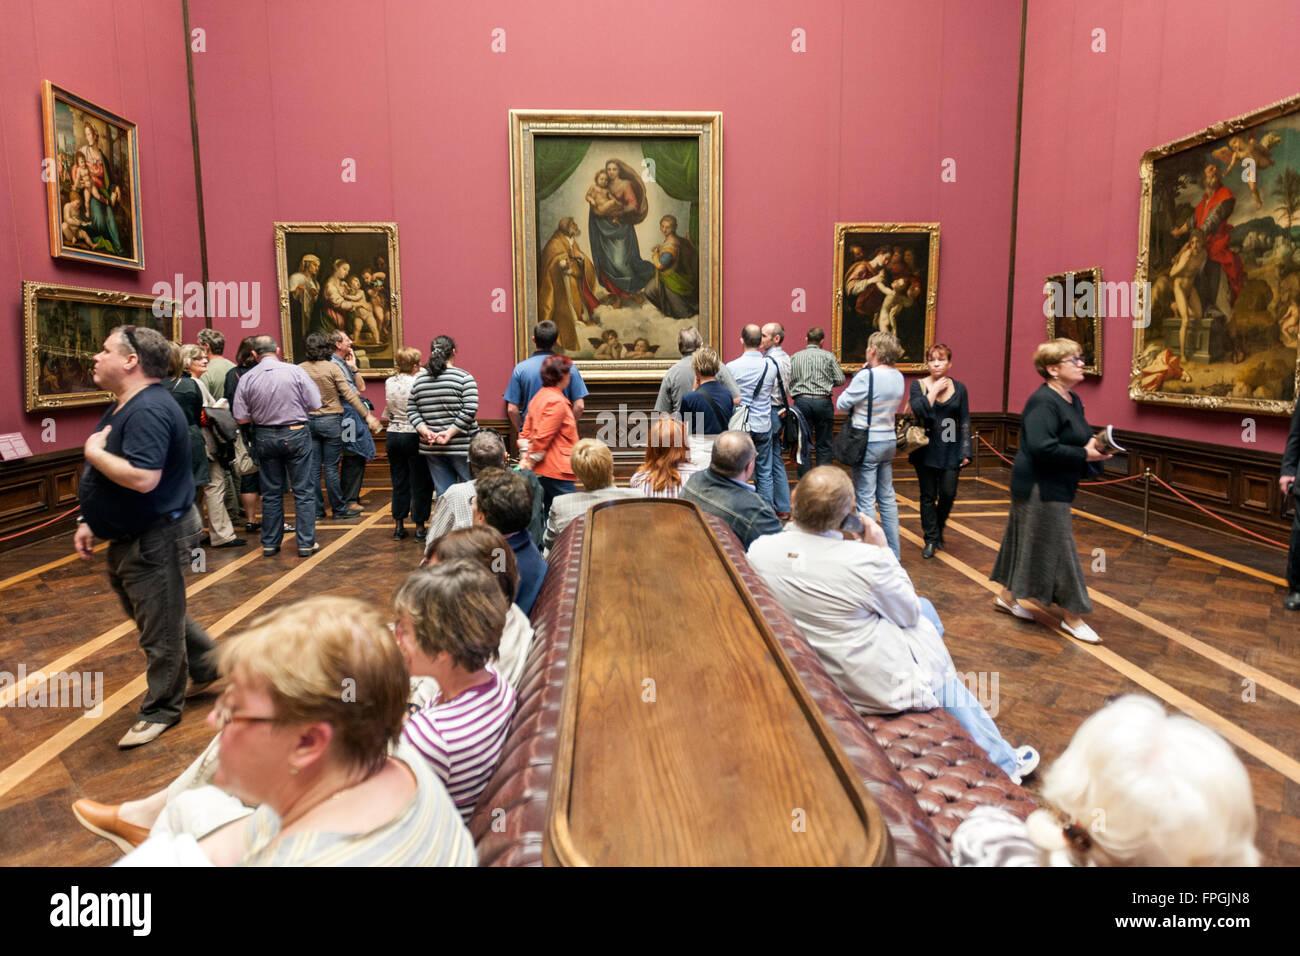 The Sistine Madonna of Raphael. Description of the picture 7